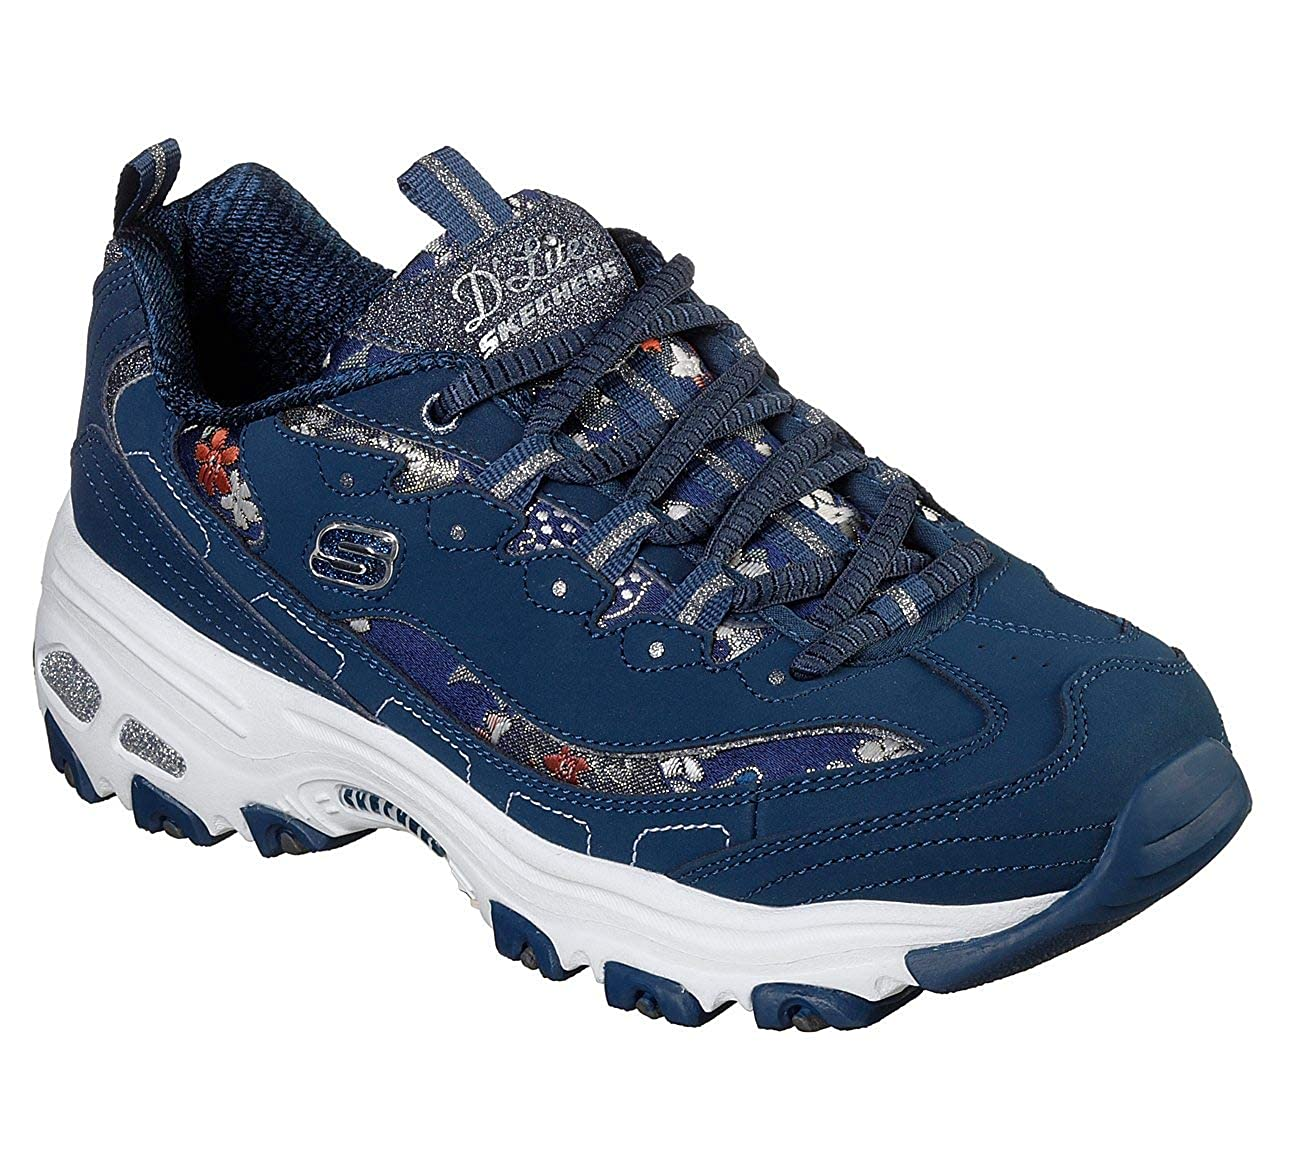 bluee (Navy Nvy) Skechers Womens D'Lites Sneaker